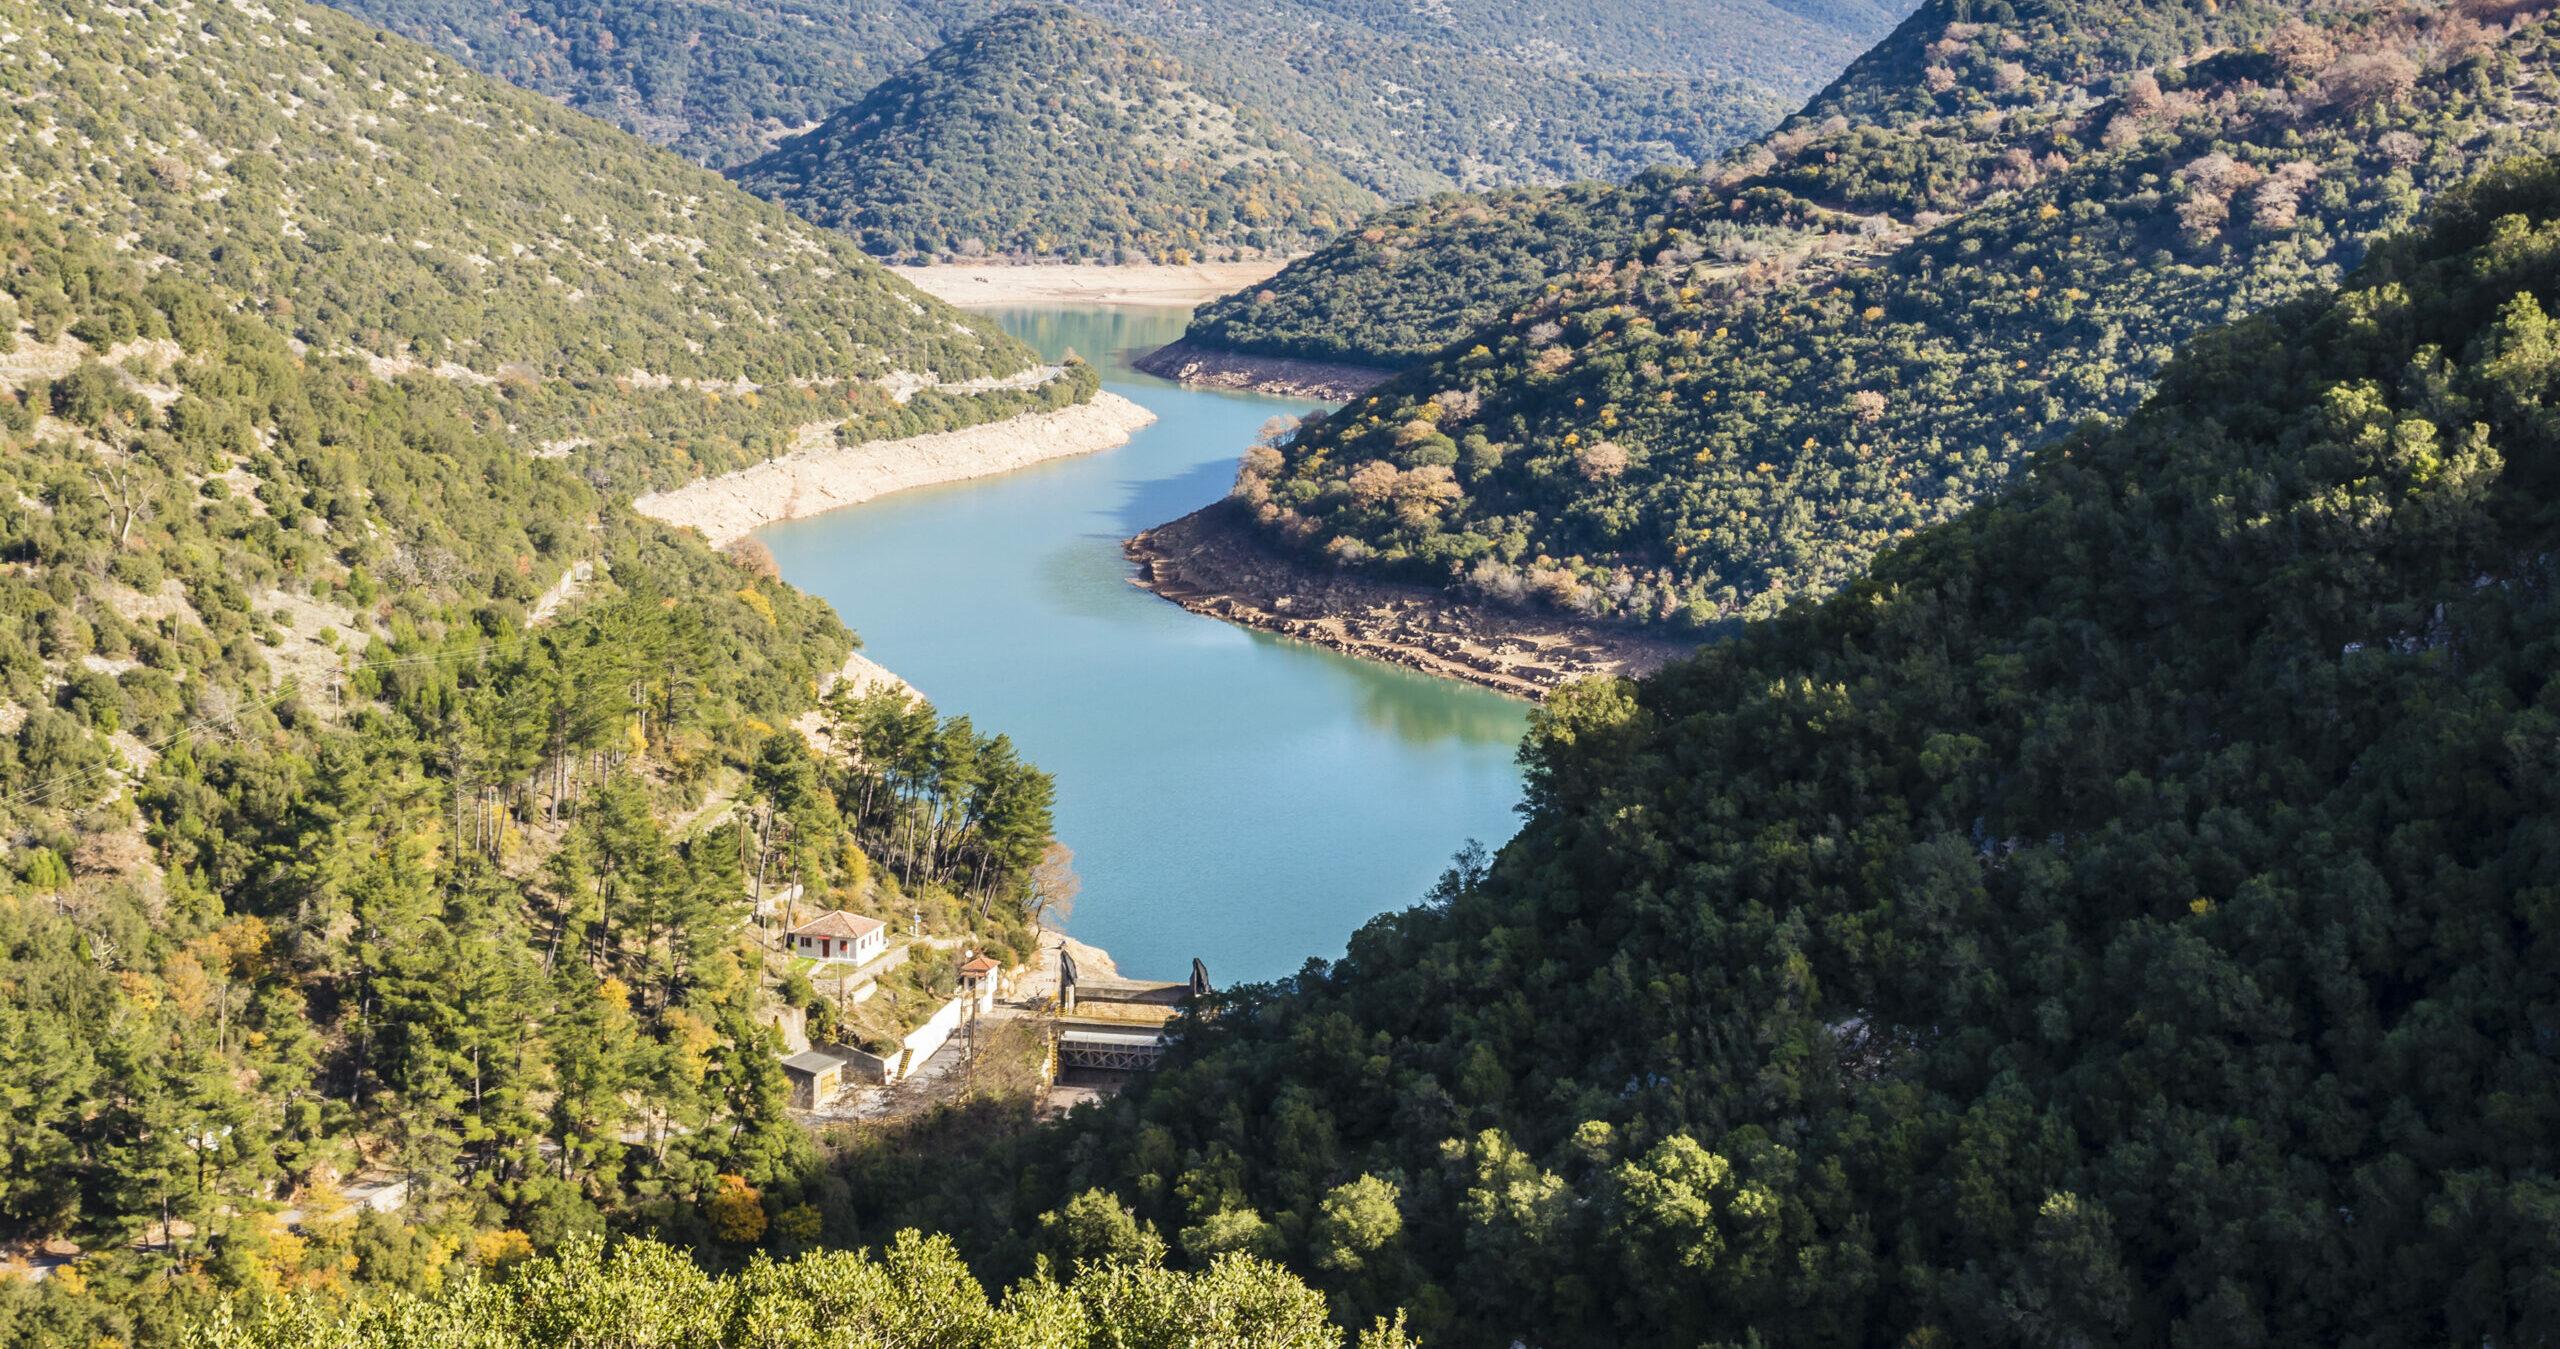 The dreamy alpine landscape in the heart of Achaia